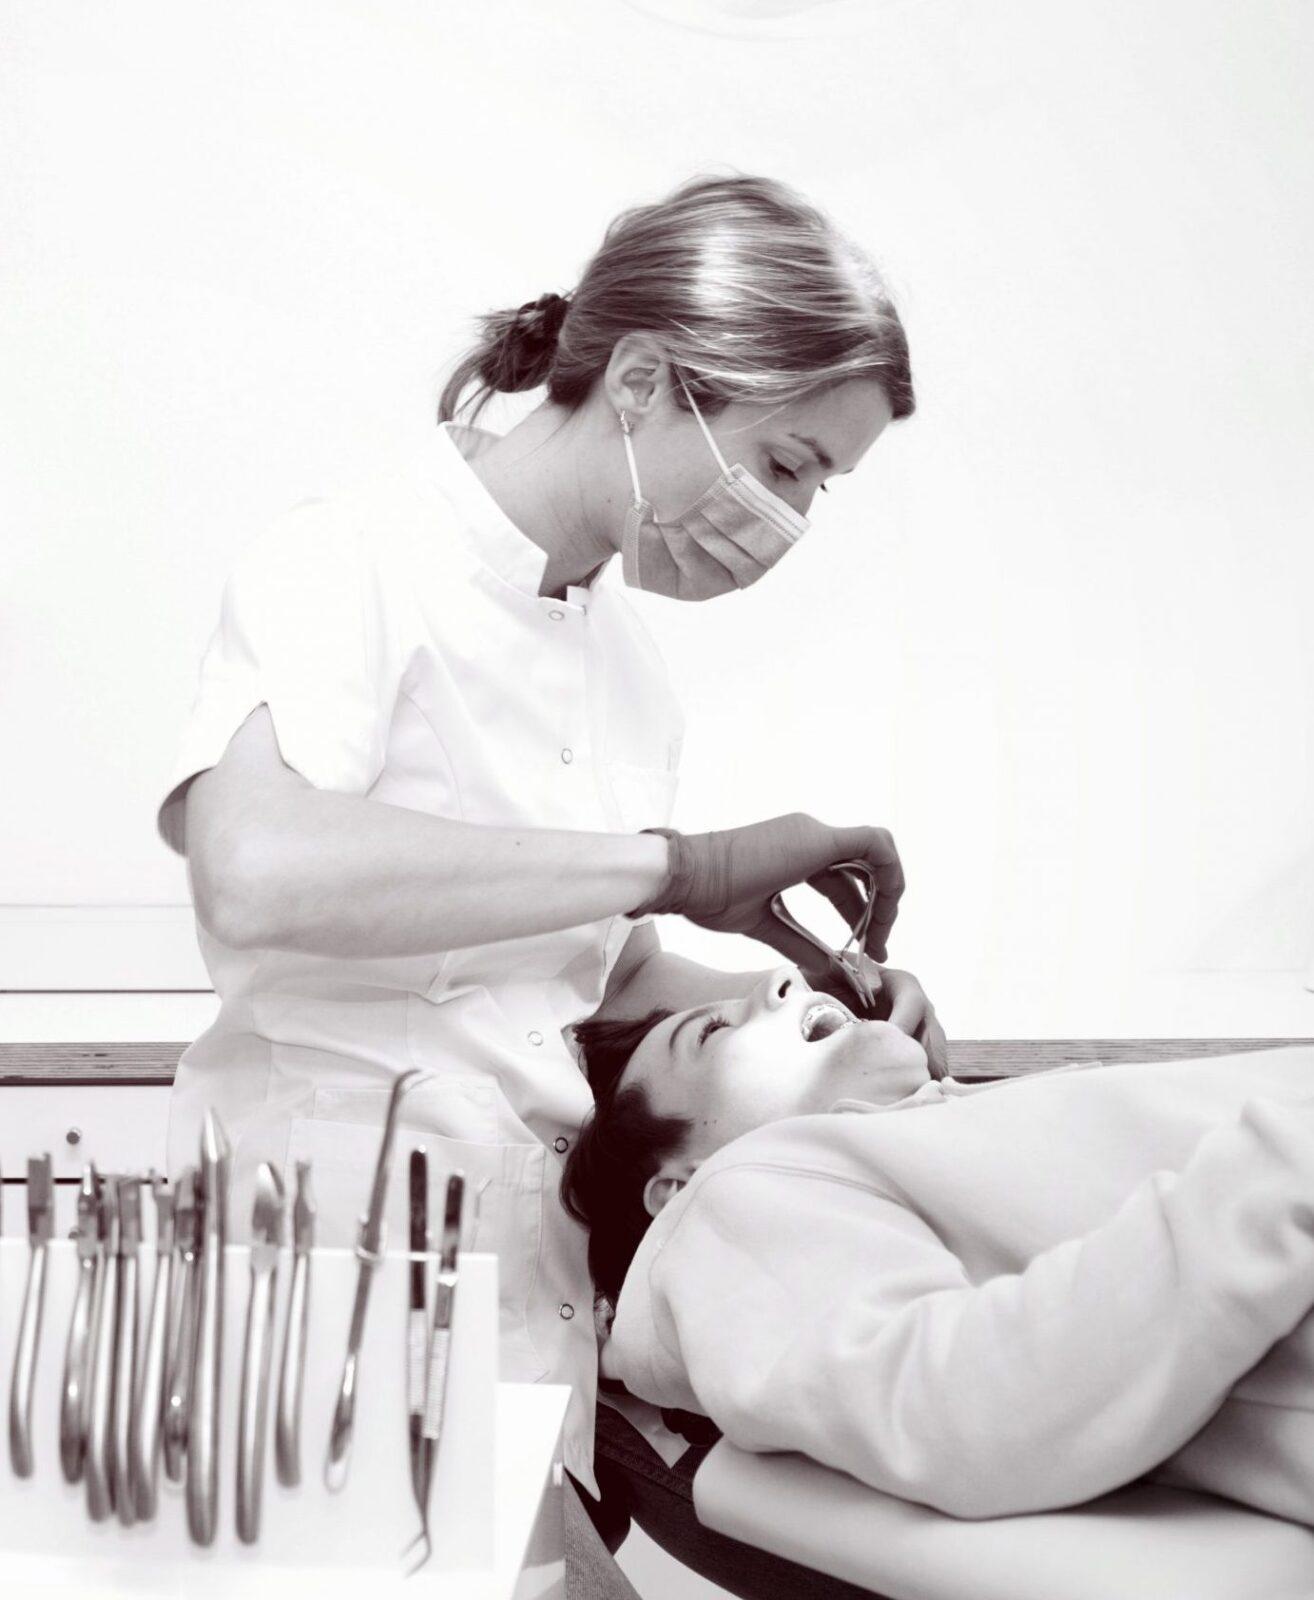 orthodontie-kerckhof-over-ons